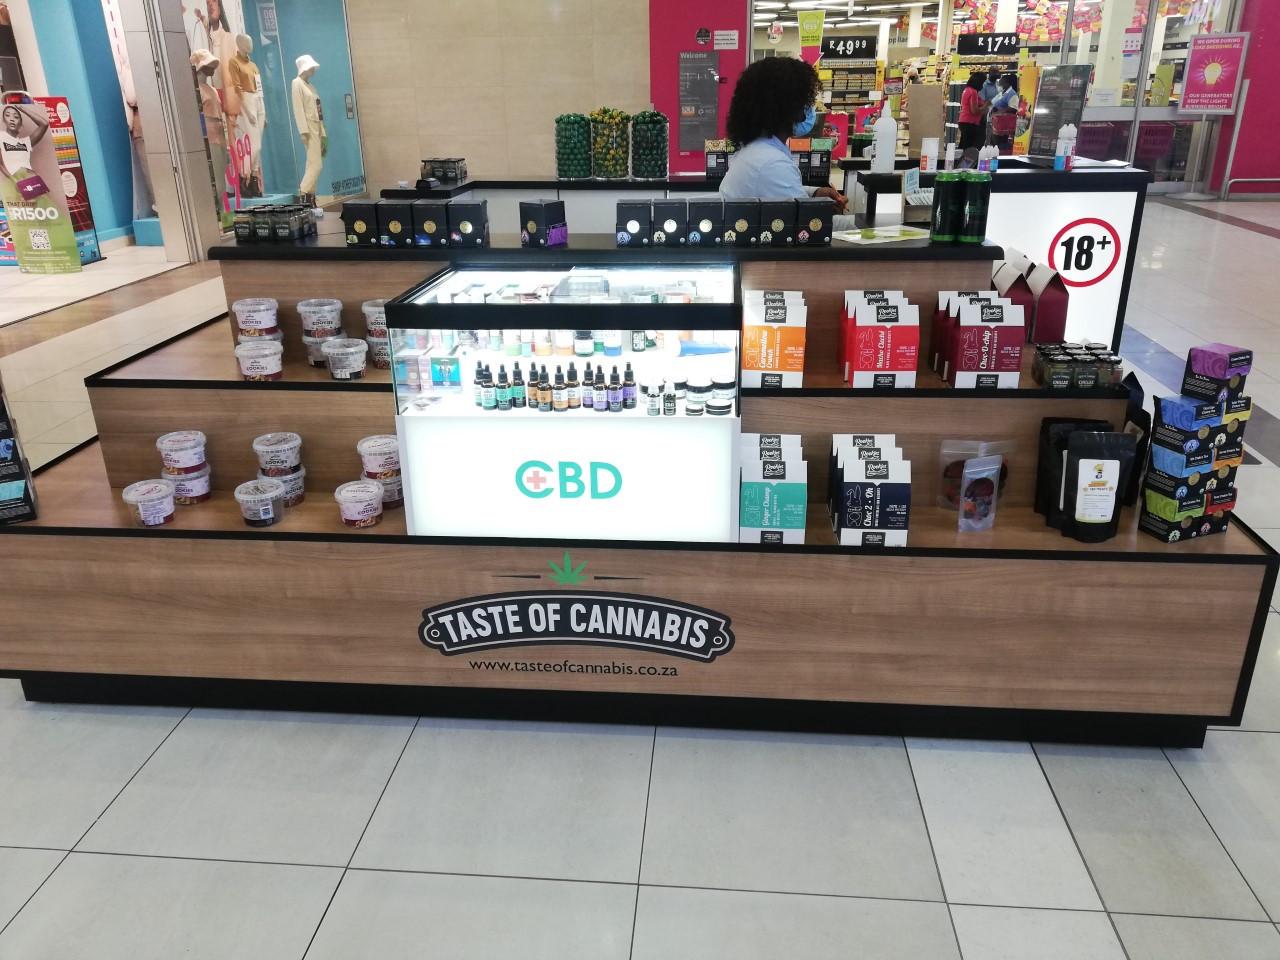 Taste of Cannabis